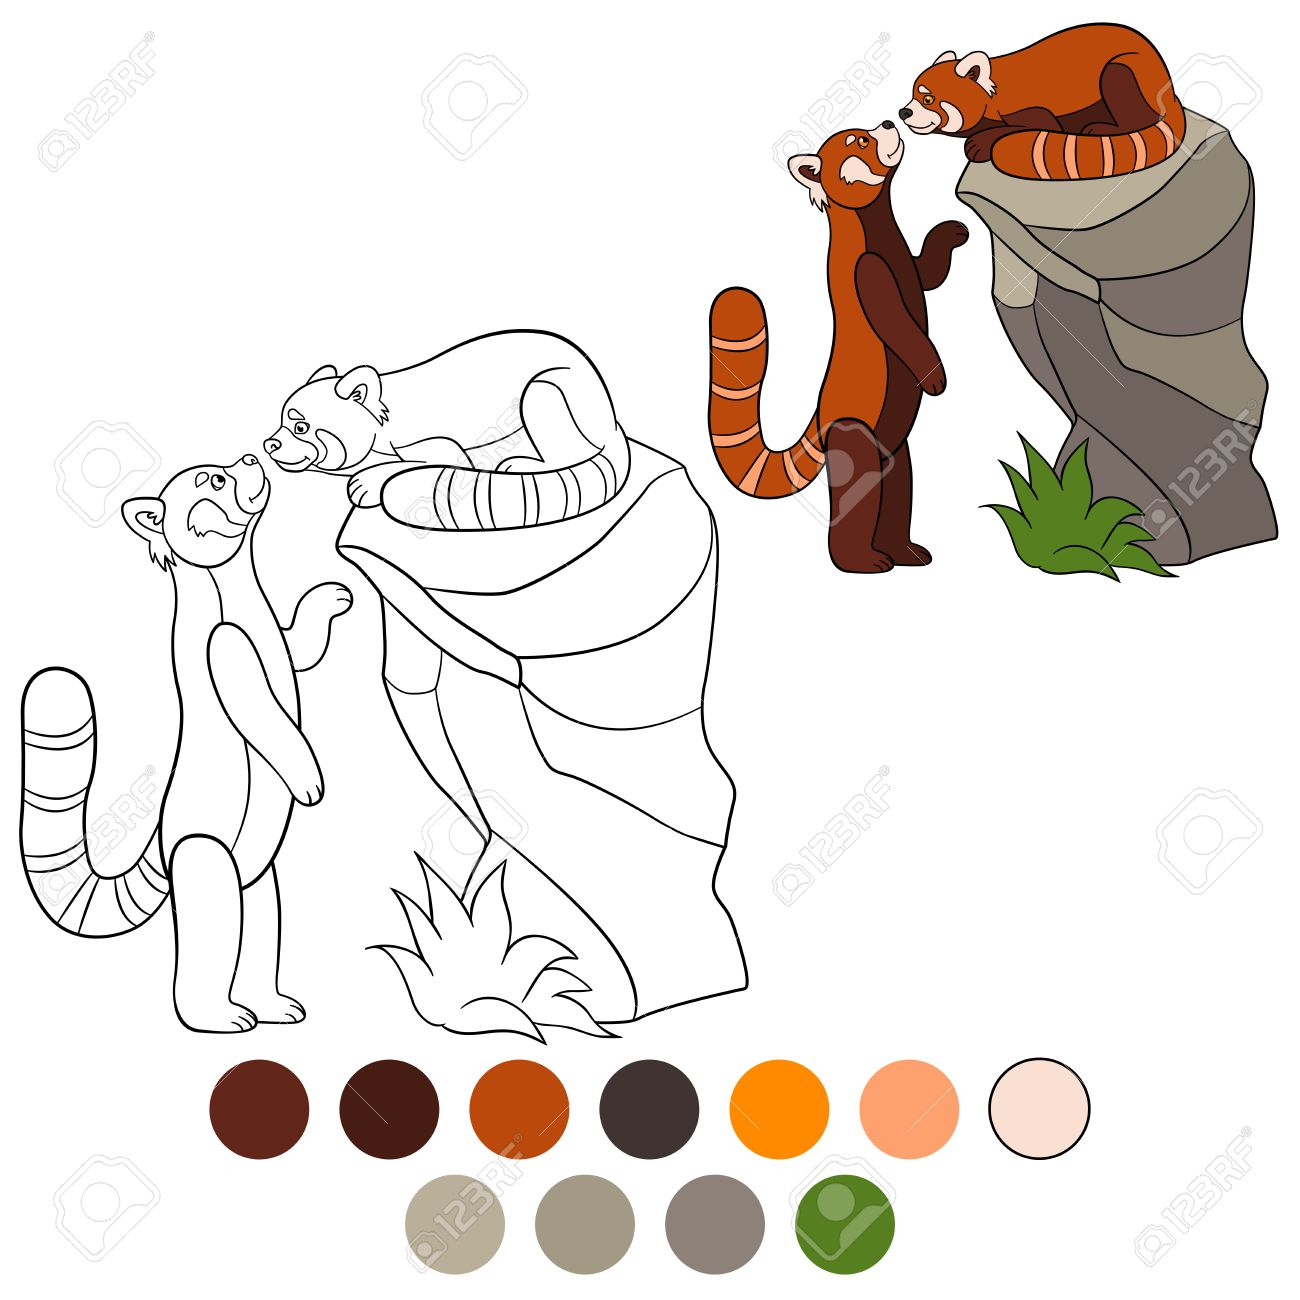 Dibujo Para Colorear Panda Rojo Dos Pequeños Osos Panda Lindo Rojo